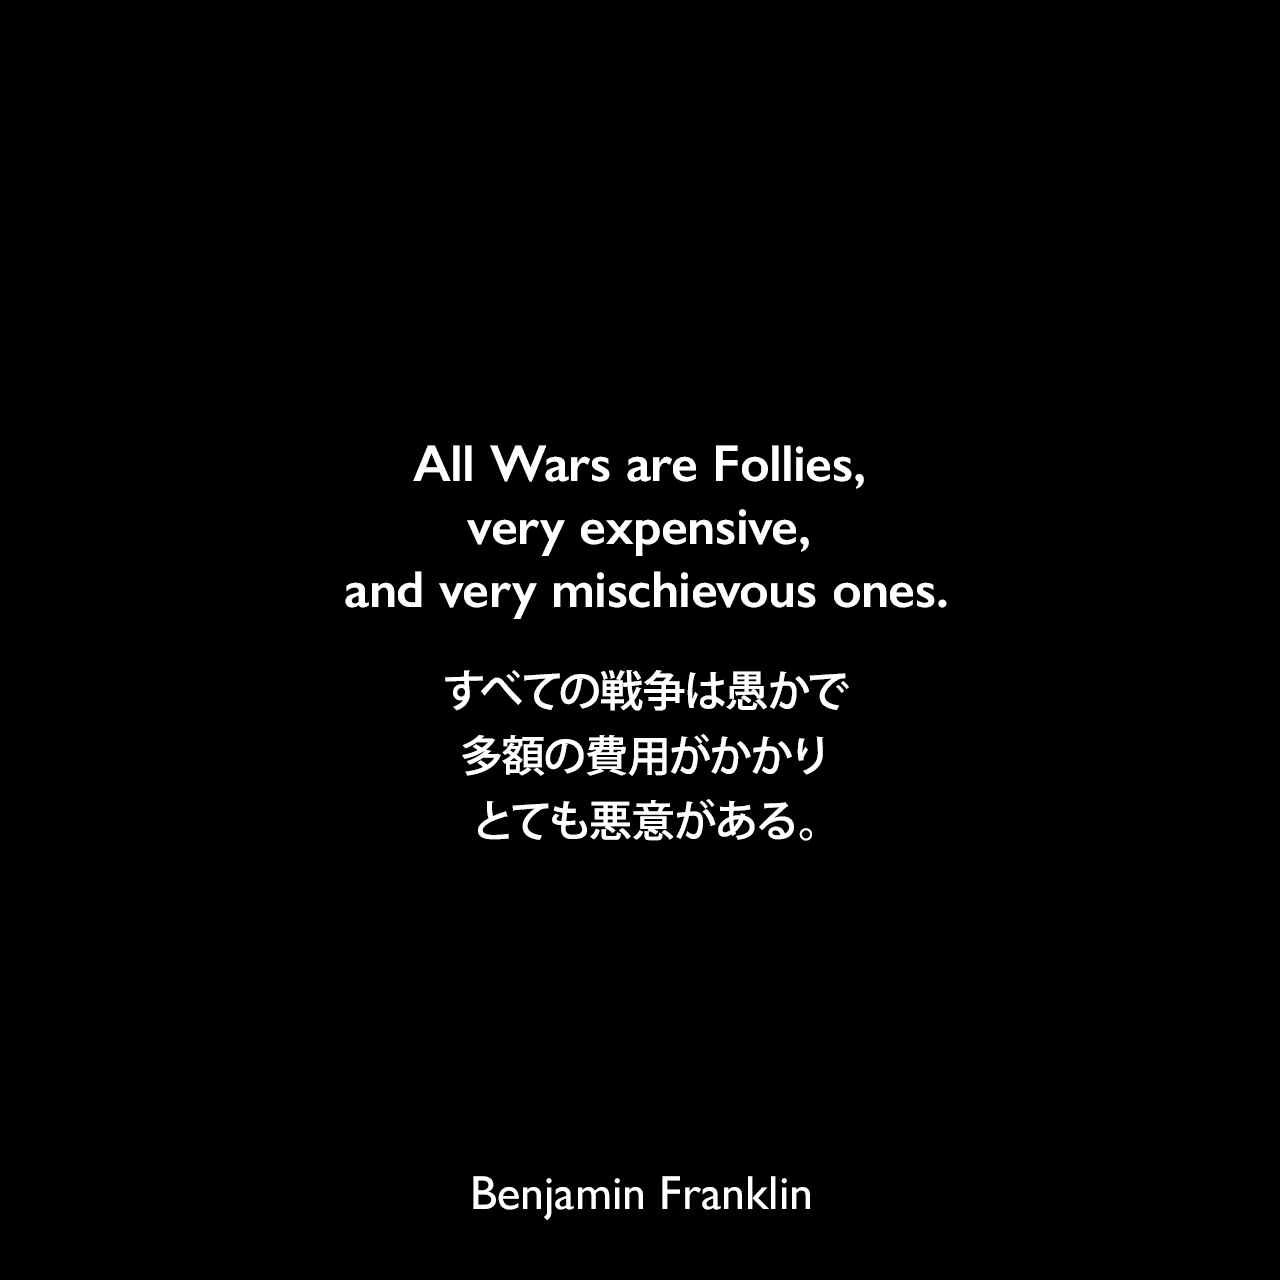 All Wars are Follies, very expensive, and very mischievous ones.すべての戦争は愚かで、多額の費用がかかり、とても悪意がある。- 1783年1月27日 ベンジャミン・フランクリンがメアリー・ヒューソンに宛てた手紙Benjamin Franklin